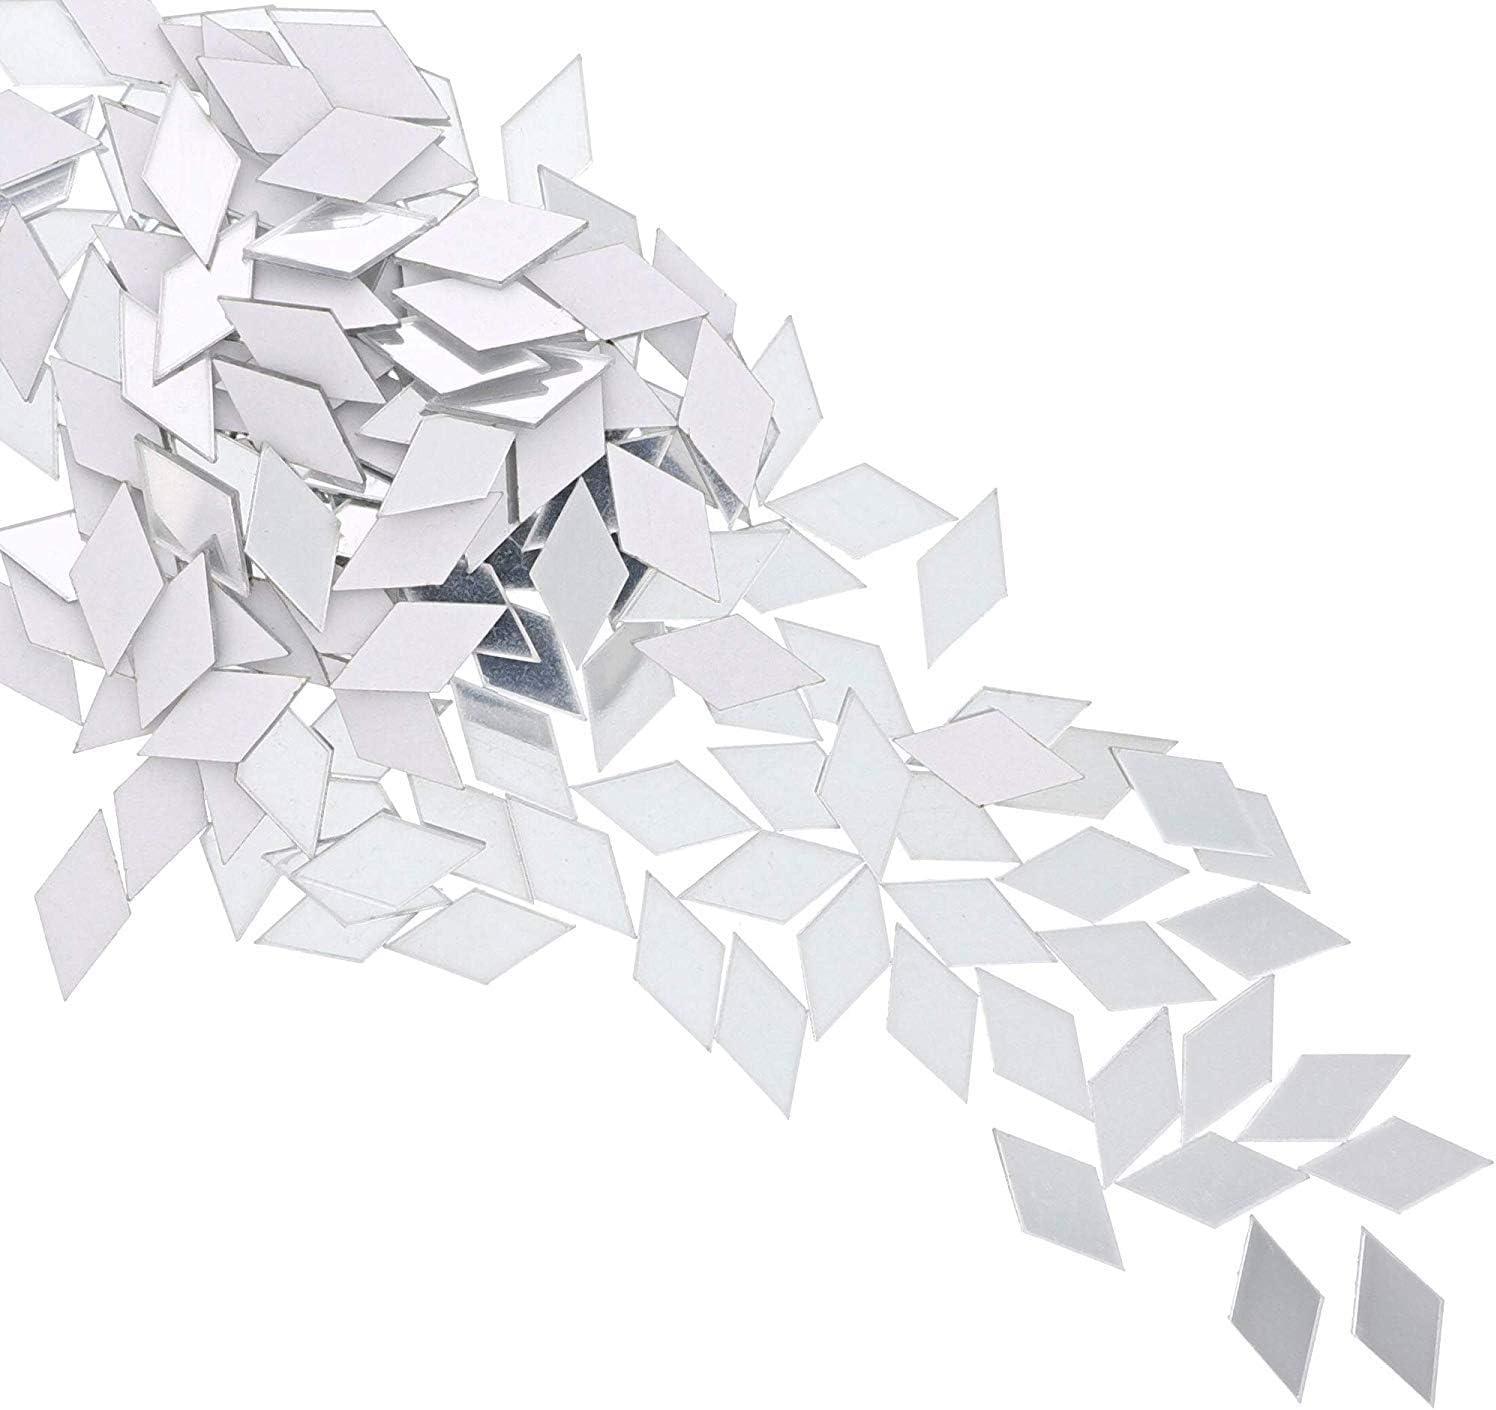 Diamond Adhesive Mirror Tiles for Wall Decor (150 Count)